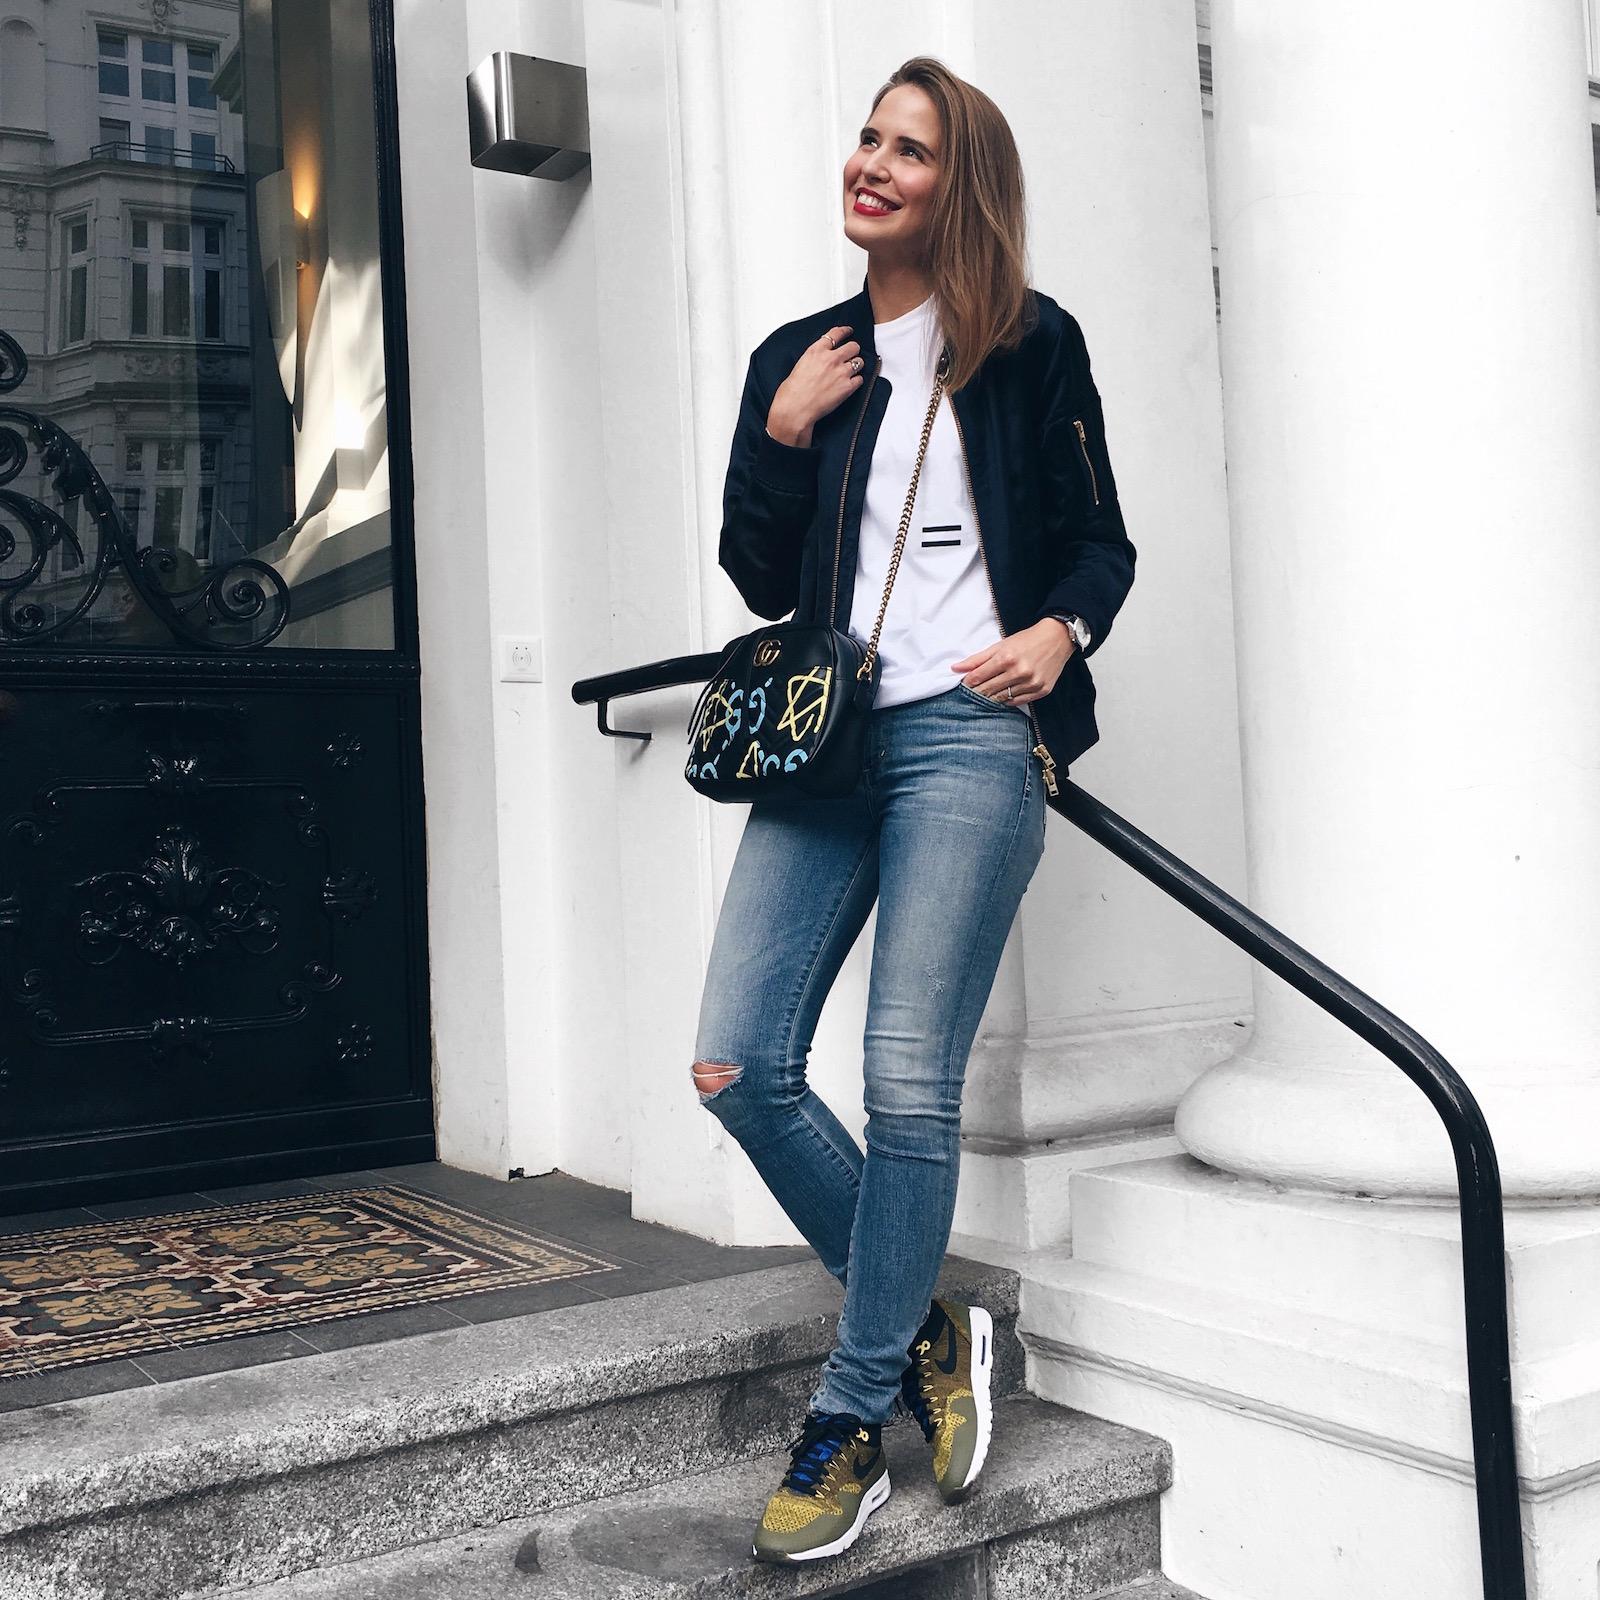 suelovesnyc sue loves nyc hamburg blog blogger unisex-bewegung closed eql